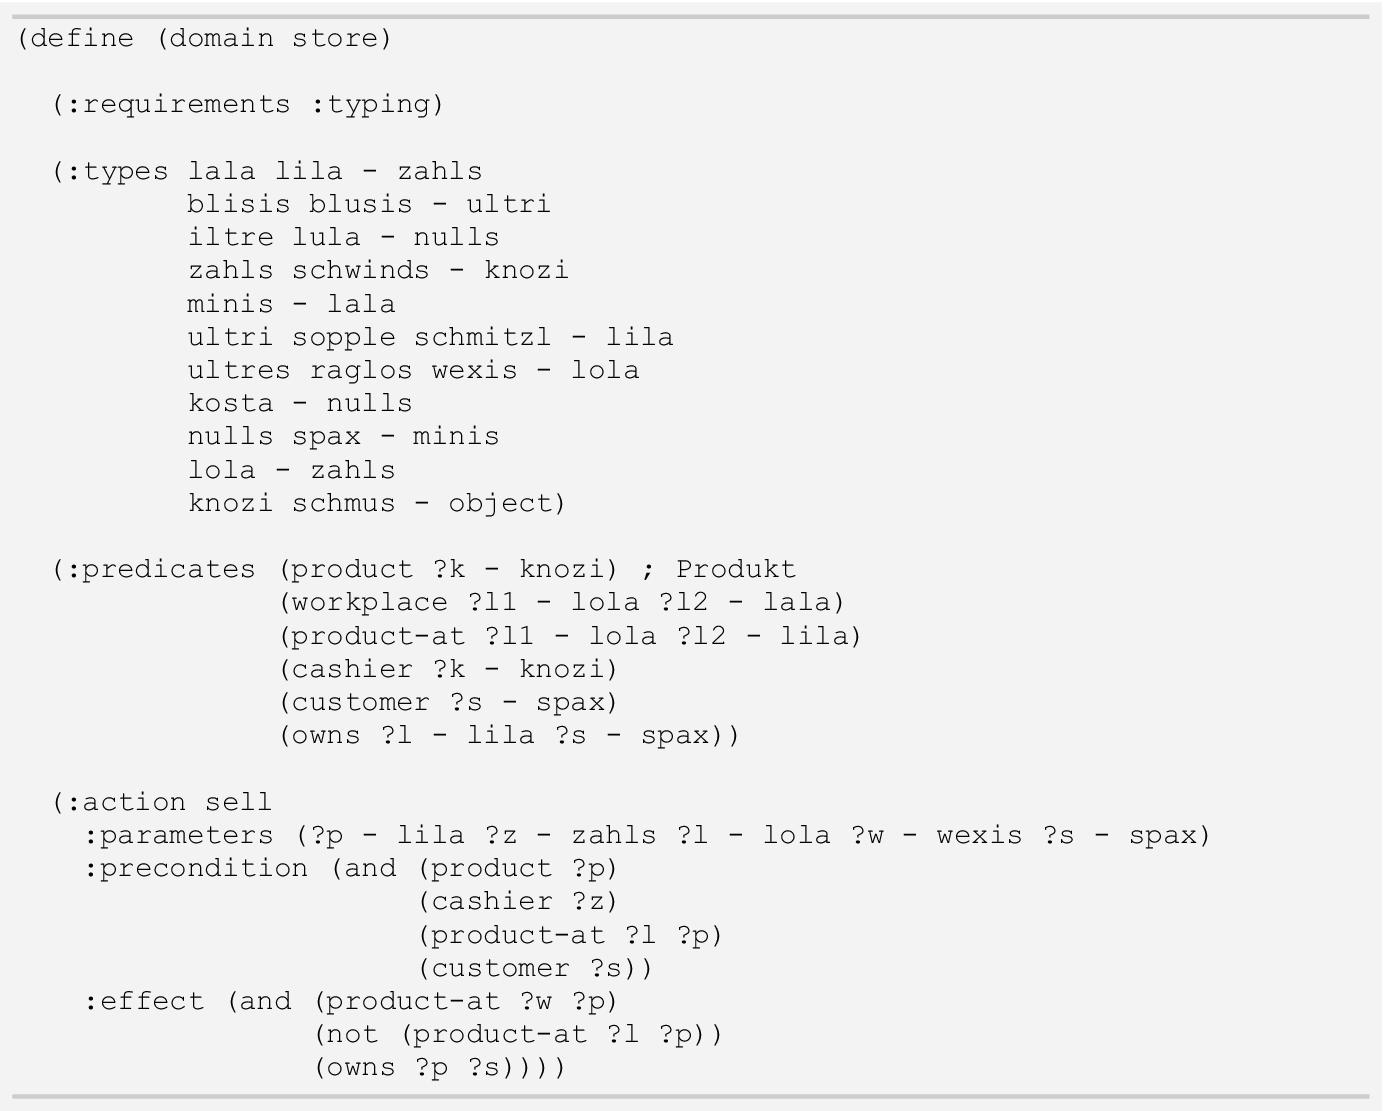 https://static-content.springer.com/image/chp%3A10.1007%2F978-3-030-38561-3_4/MediaObjects/486735_1_En_4_Figj_HTML.png